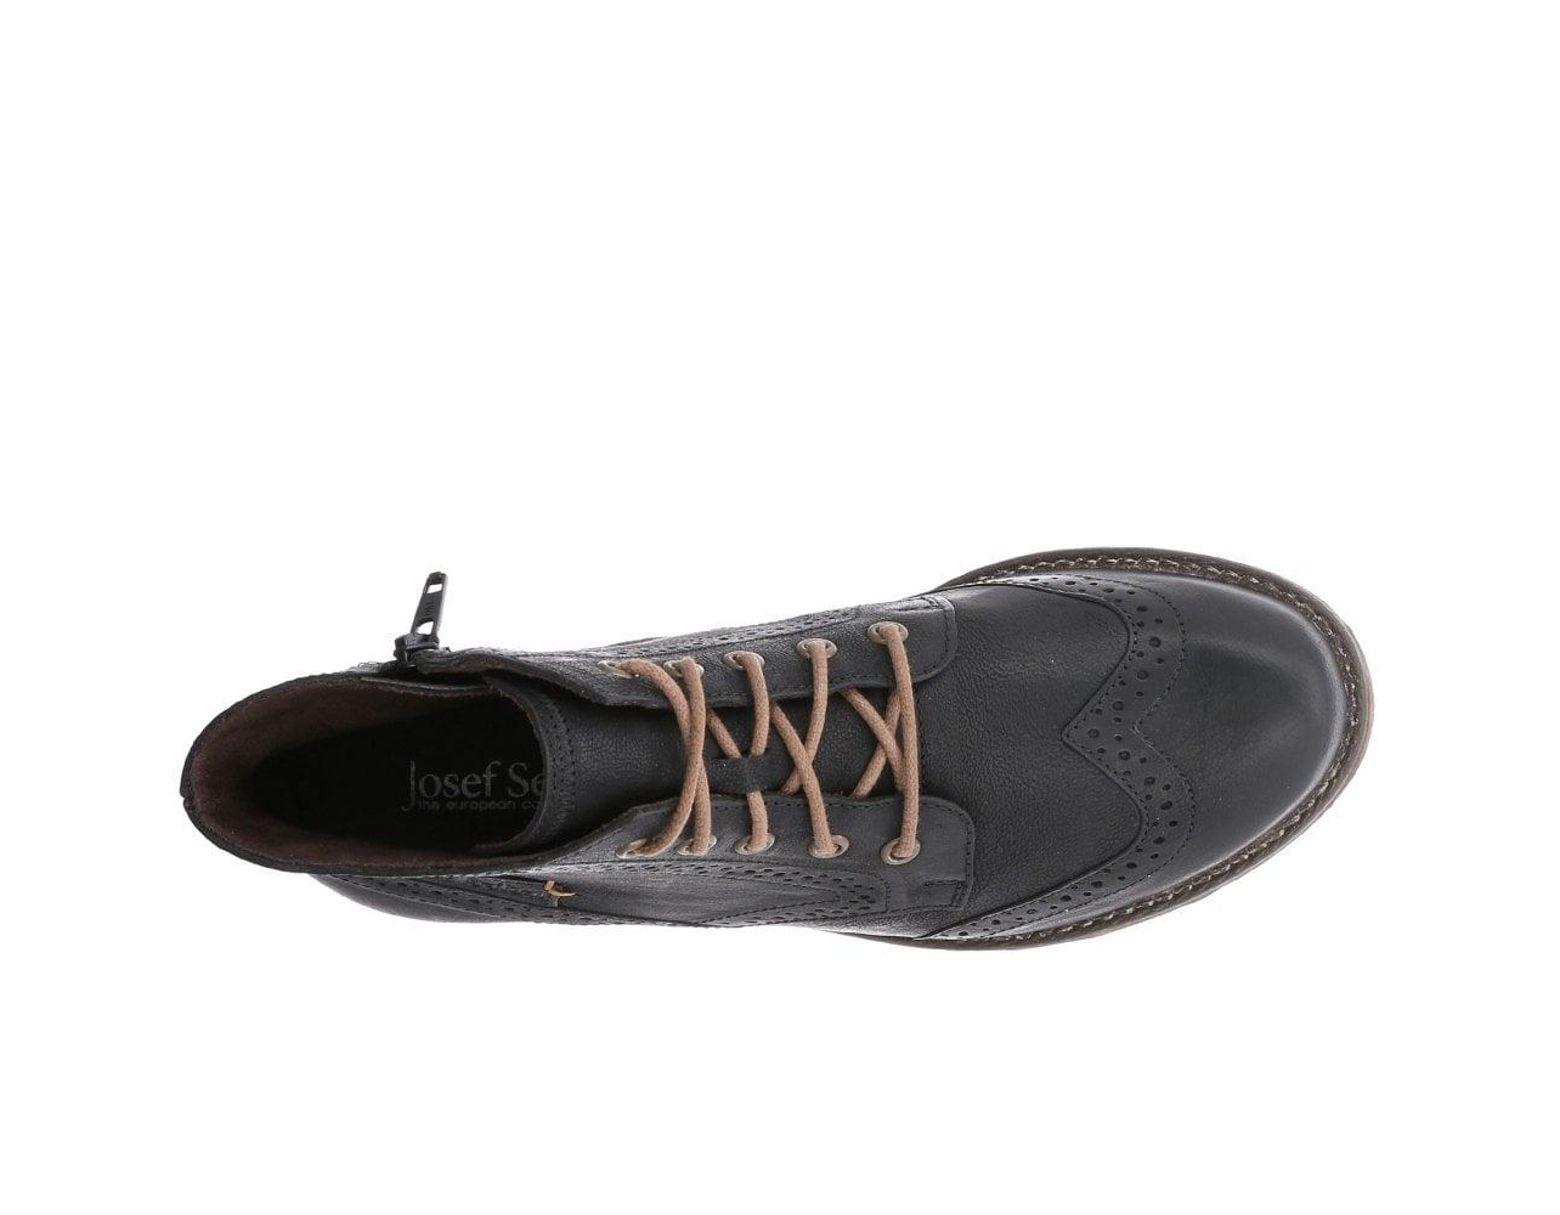 07d2c3cec70 Black Sienna 74 Womens Brogue Ankle Boots